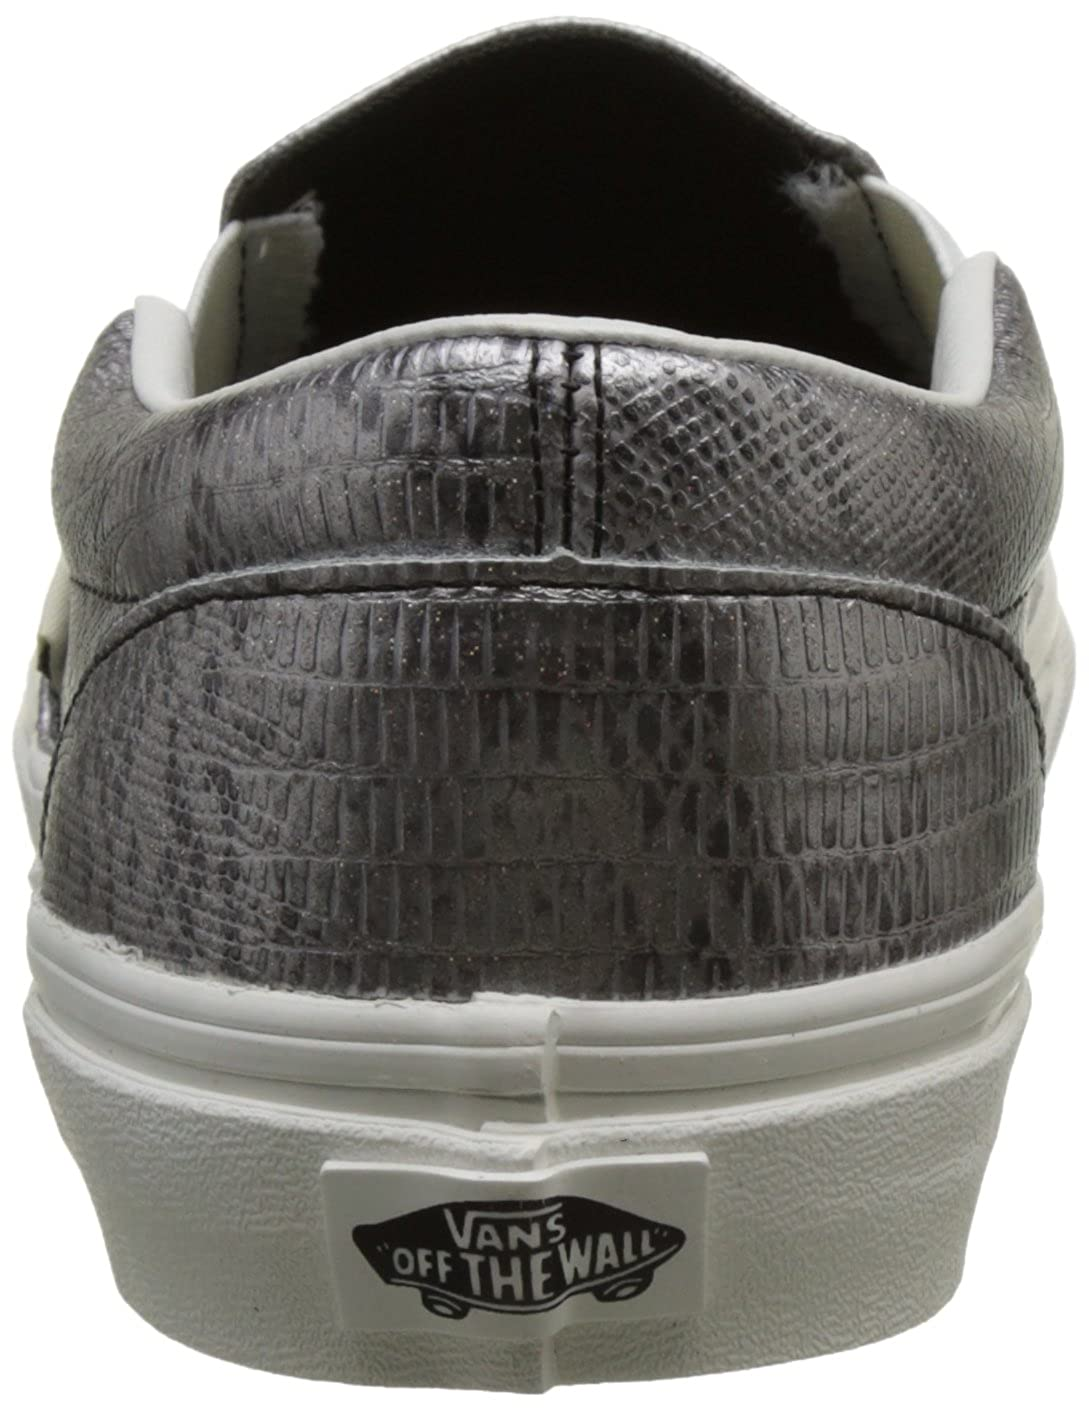 7b3c8b75614 Vans Unisex Adults  Classic Slip-on Low-Top Sneakers  Amazon.co.uk  Shoes    Bags